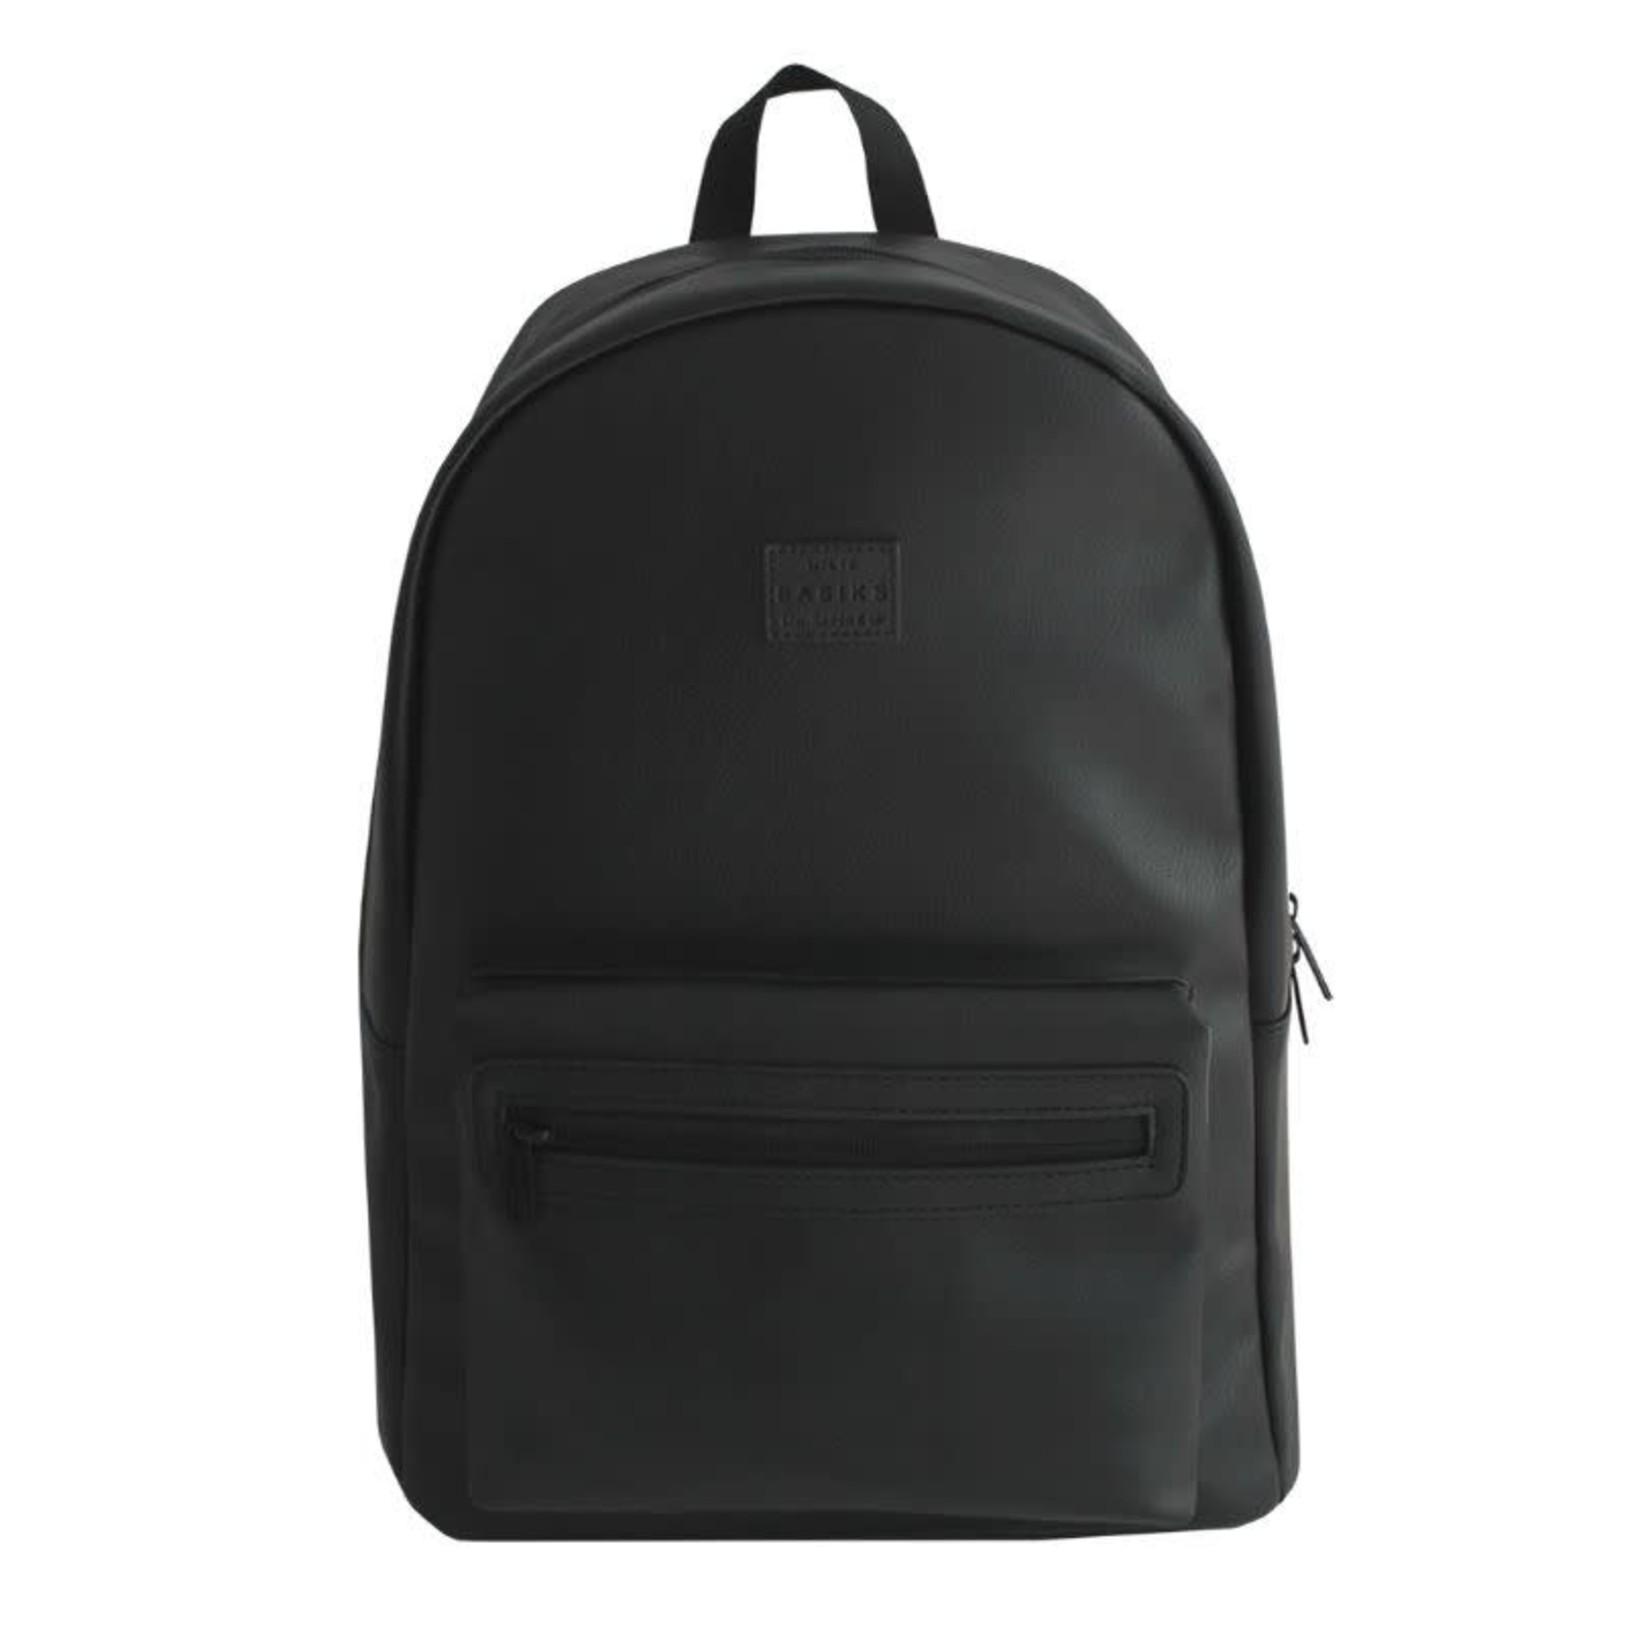 Basiks.Co Basiks.Co : Independant Vegan Leather Backpack,Black,O/S